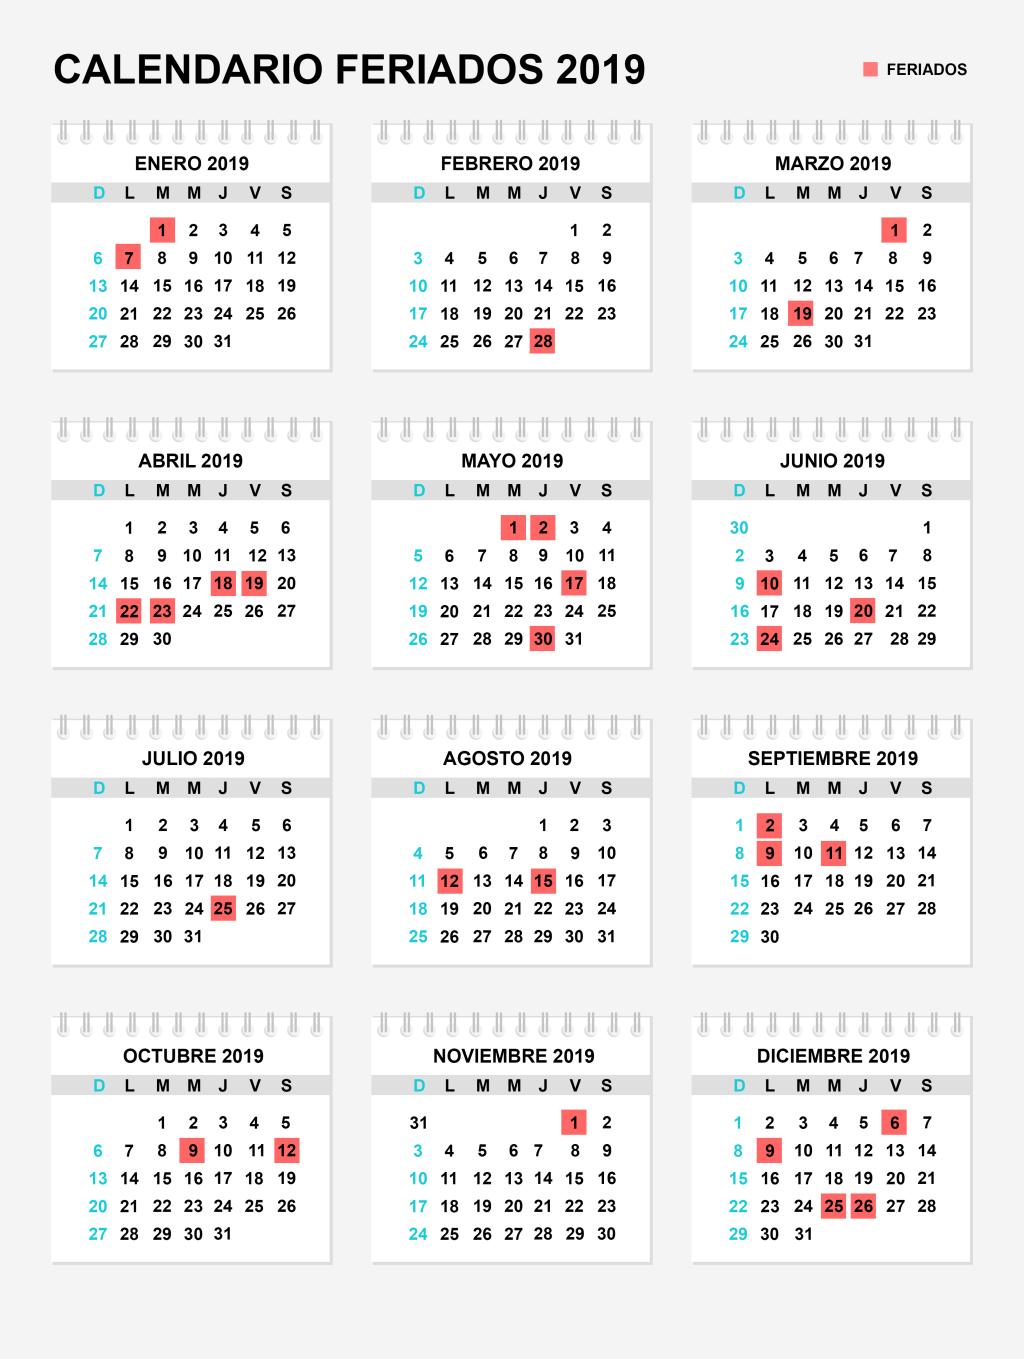 Calendario Laboral 2019 Andalucia.Calendario Laboral Ano 2019 Espana Dias Festivos Y Puentes Por